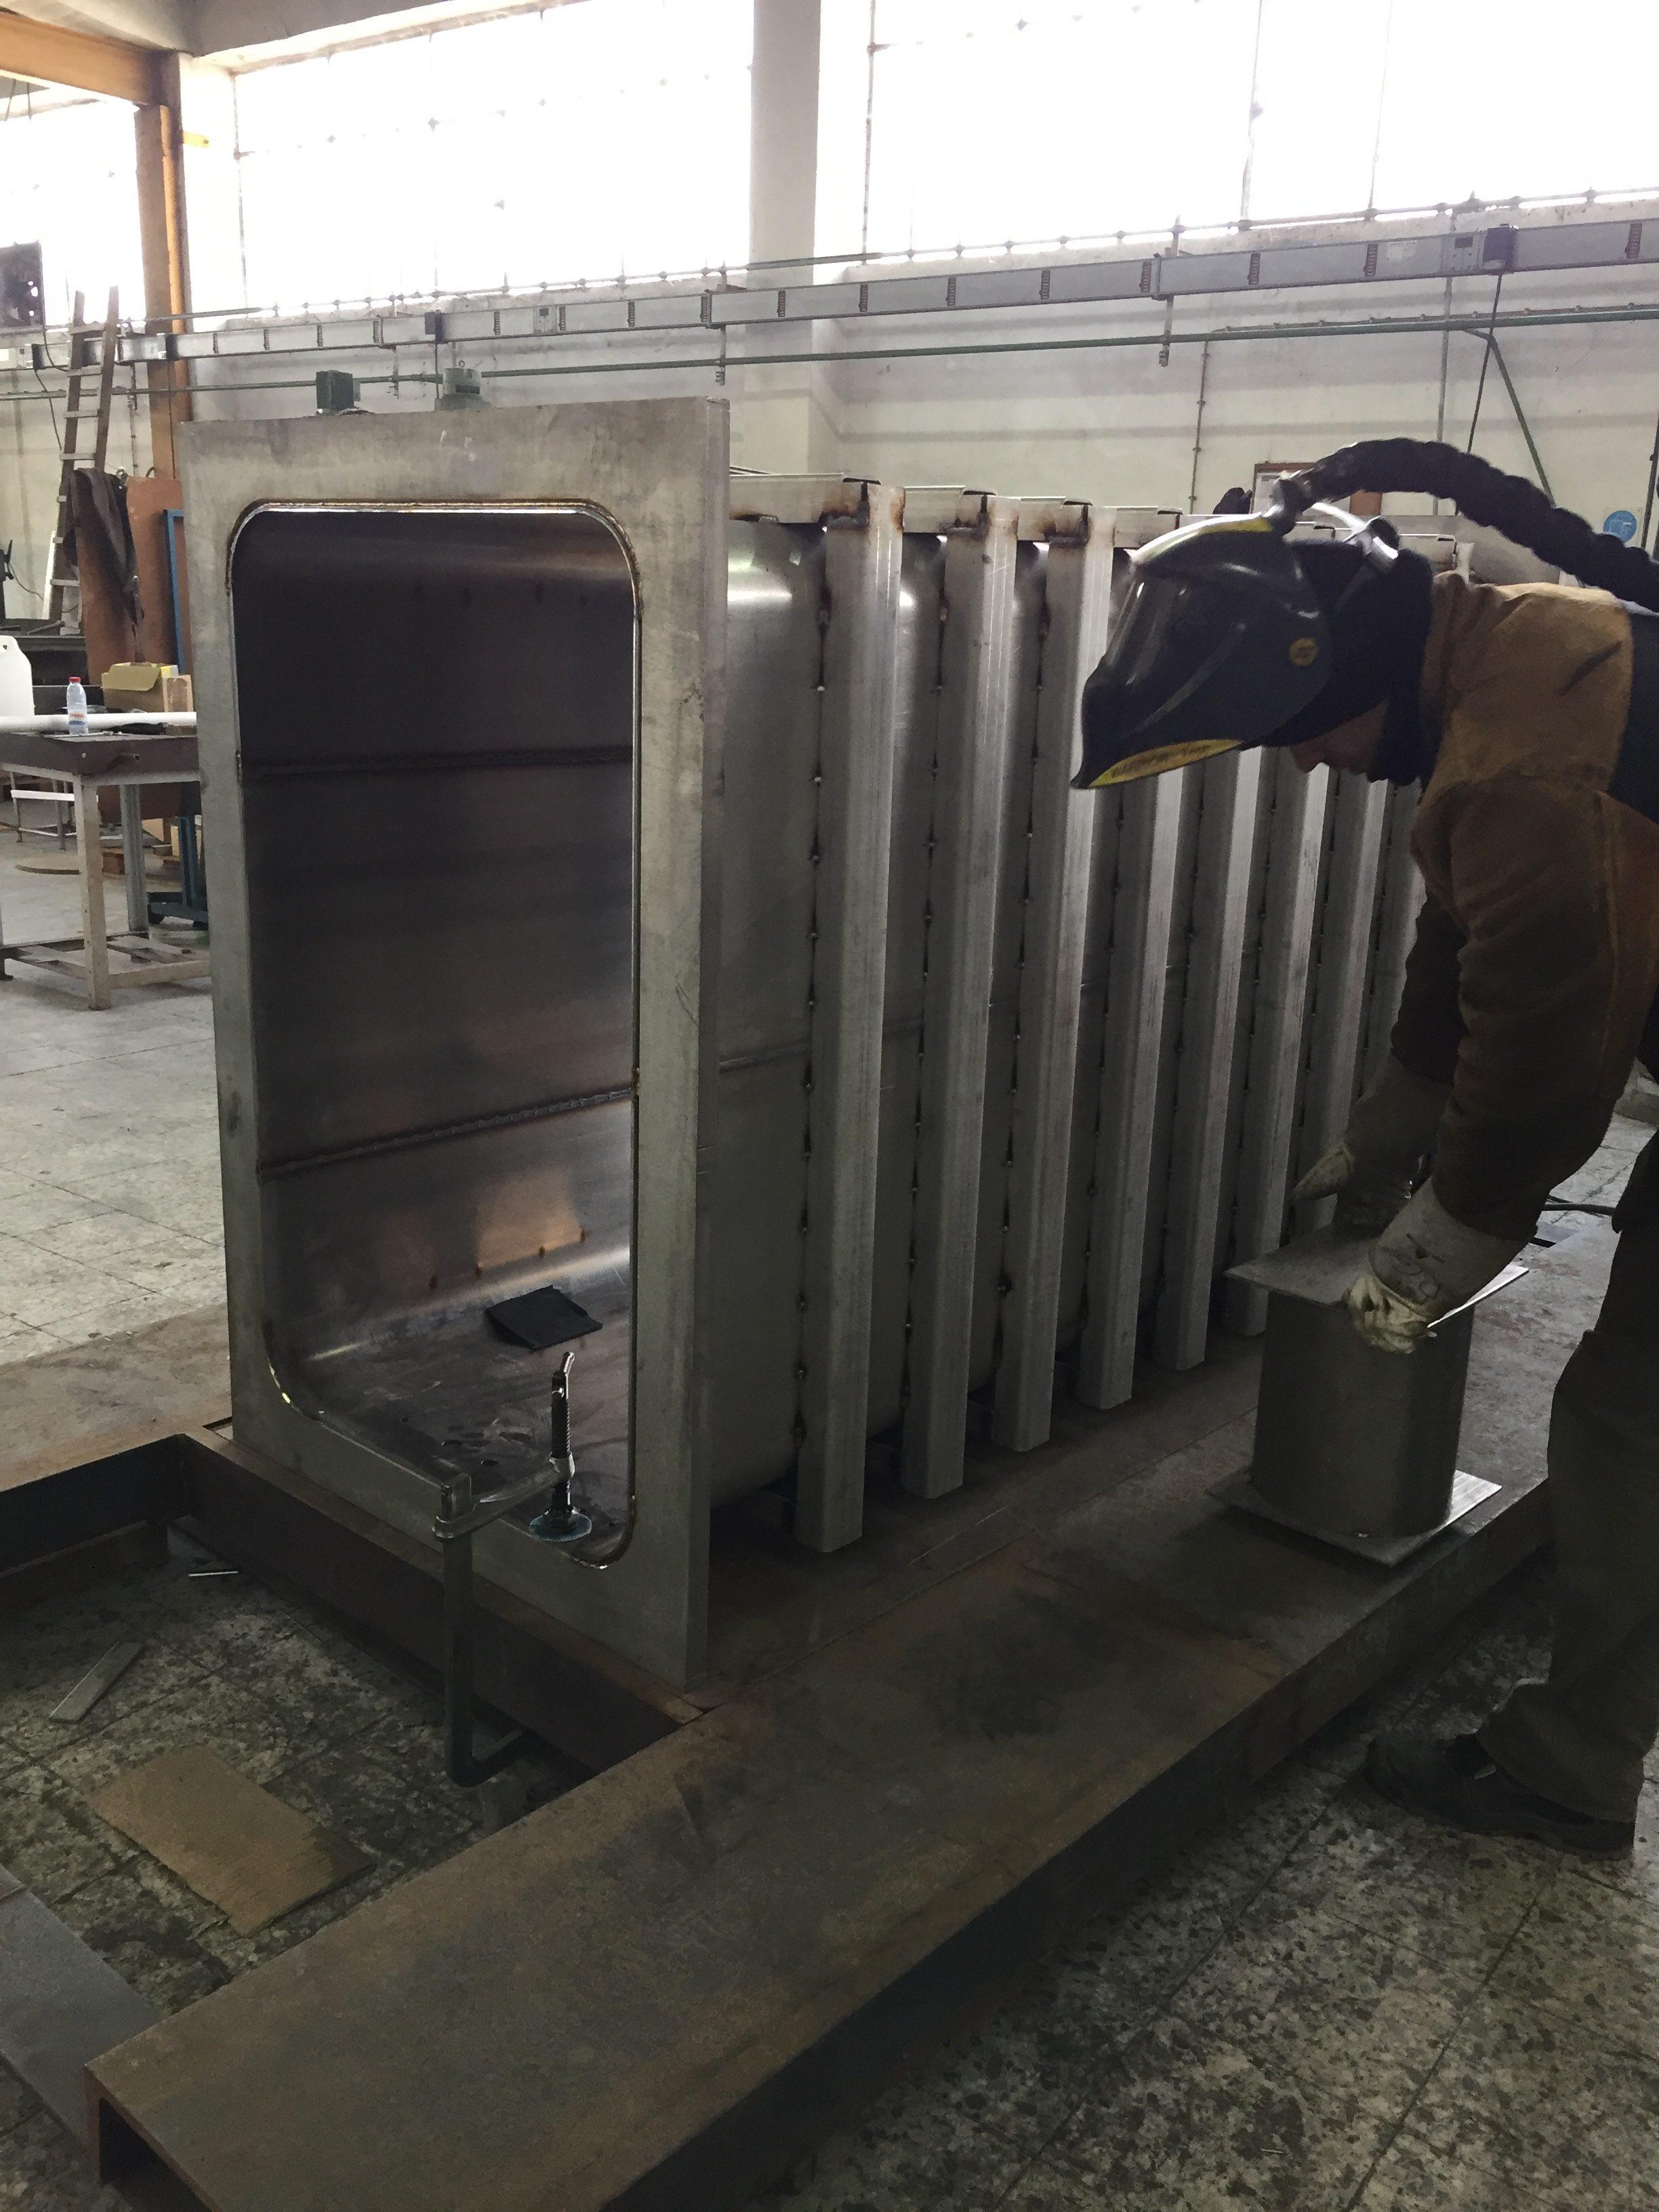 AJC - Construction